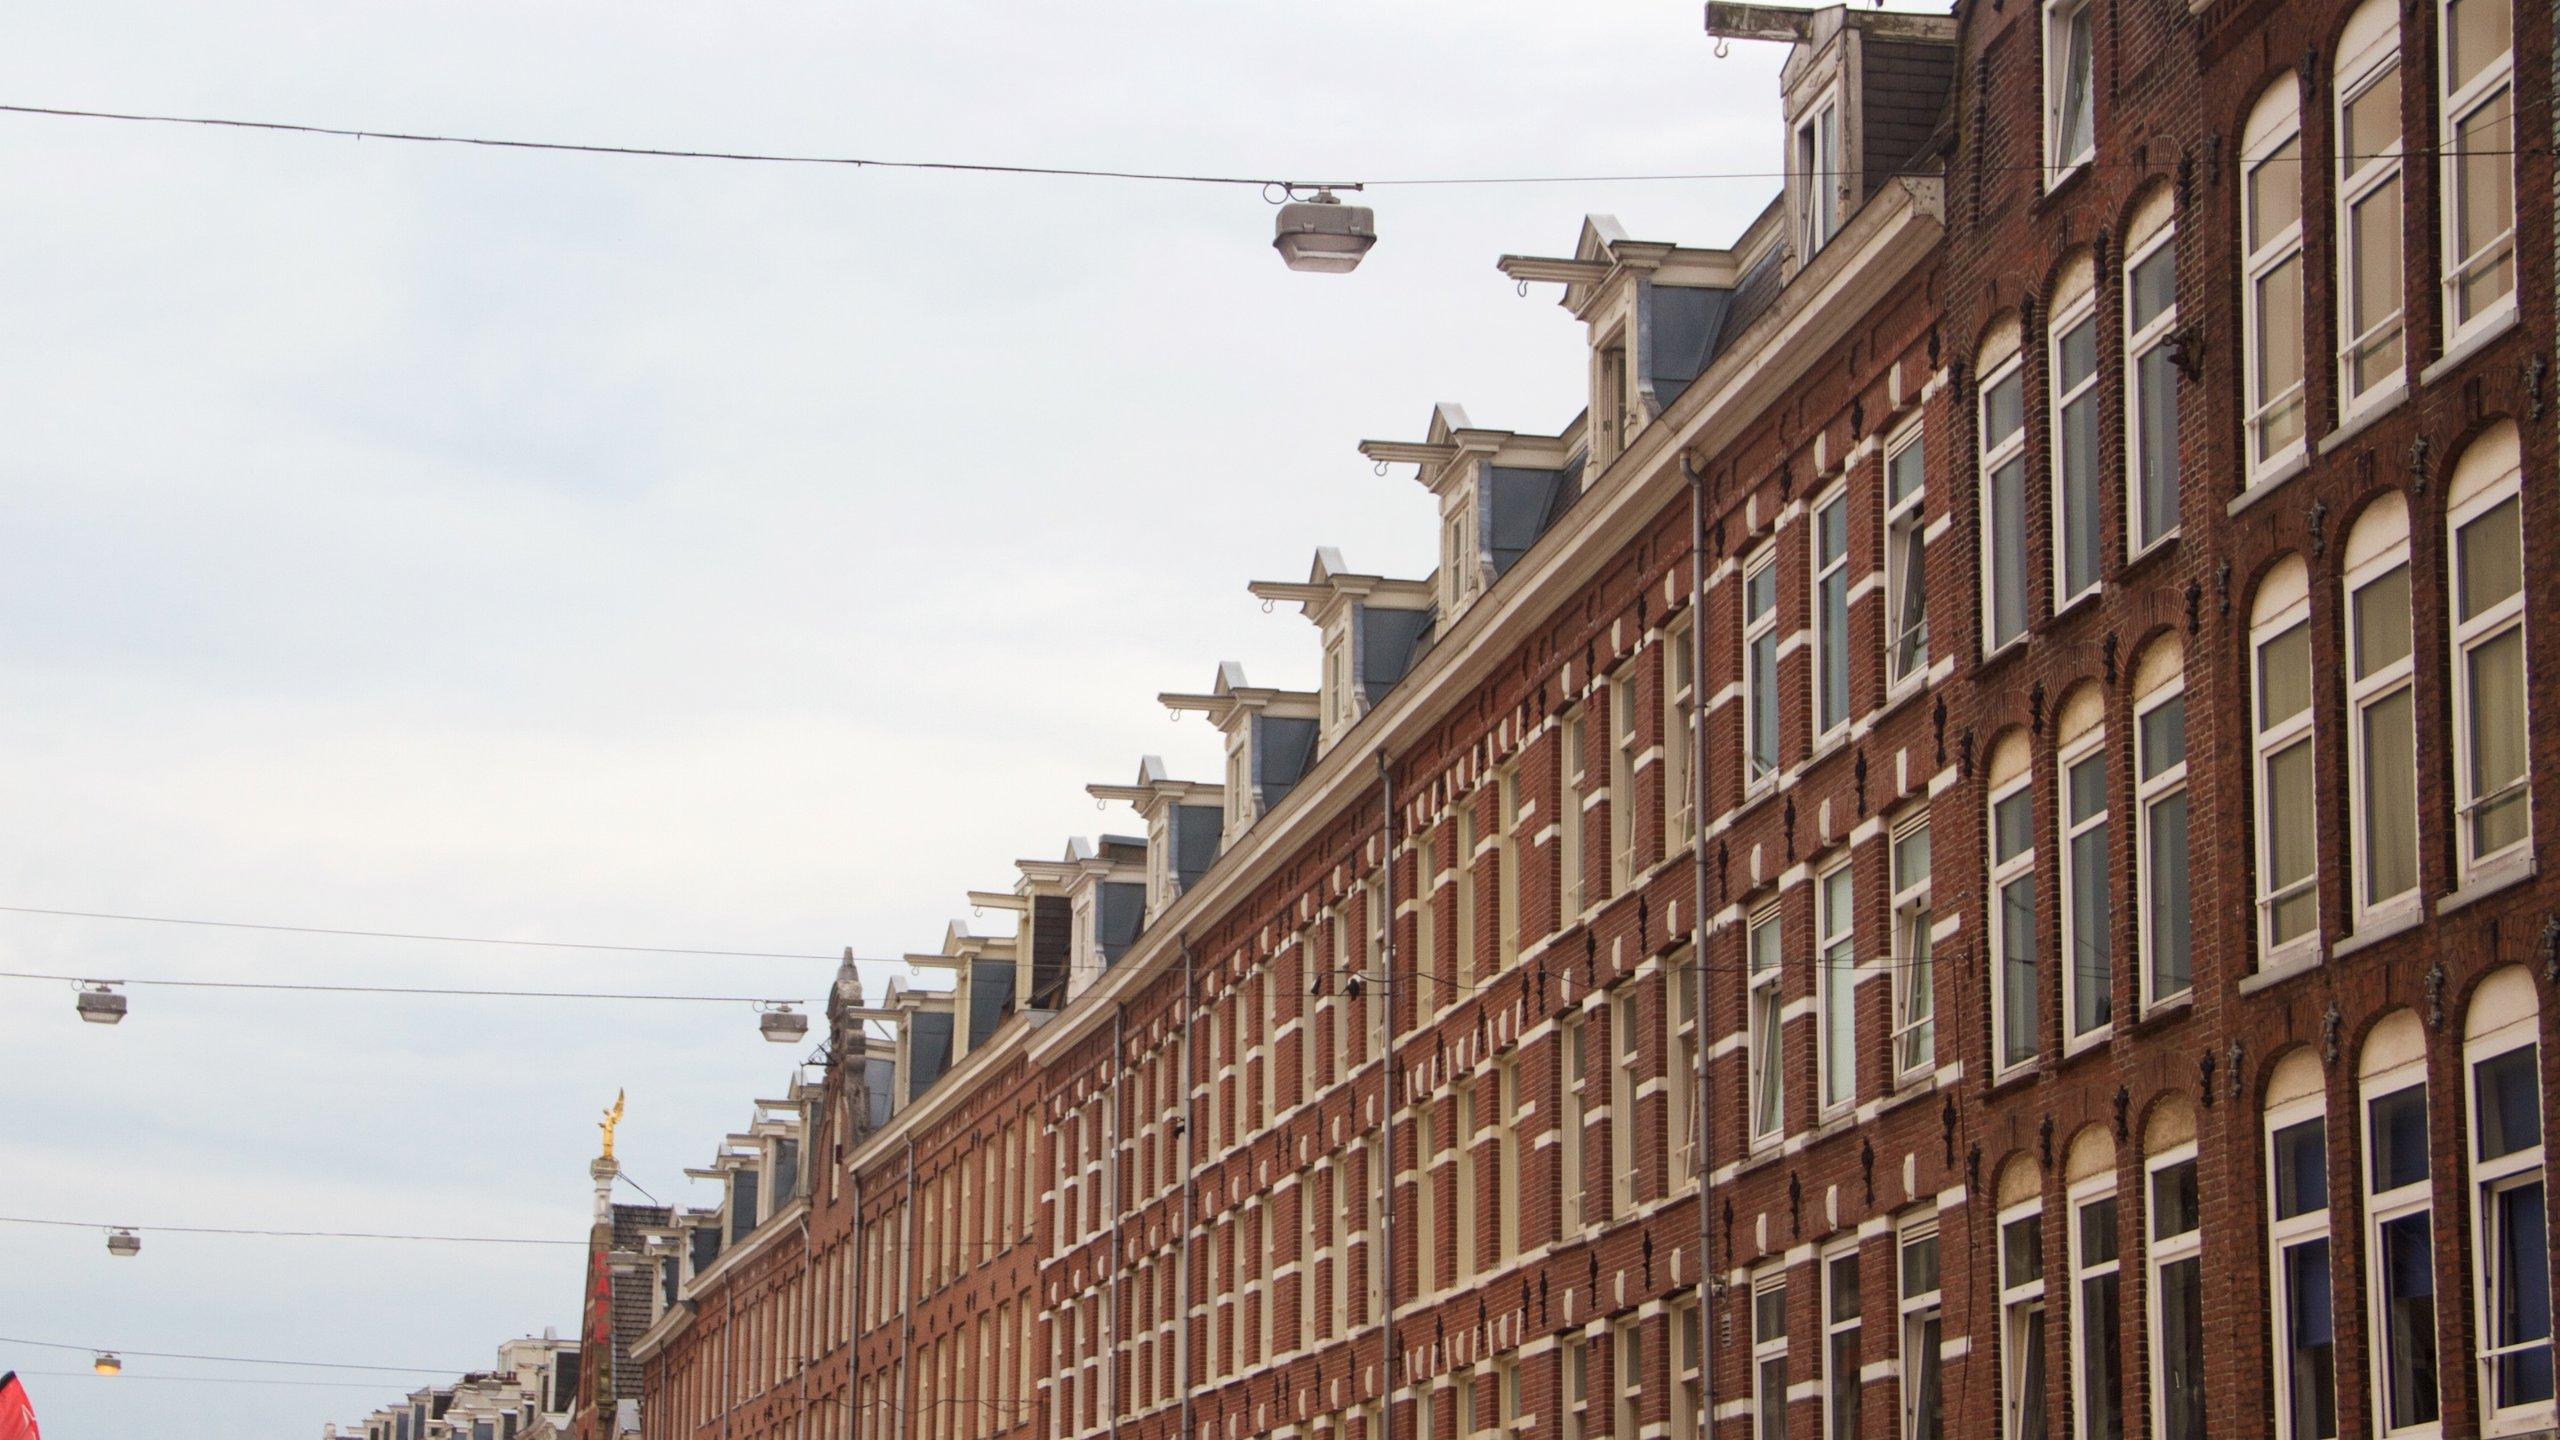 Albert Cuyp Markt, Amsterdam, Nordholland, Niederlande